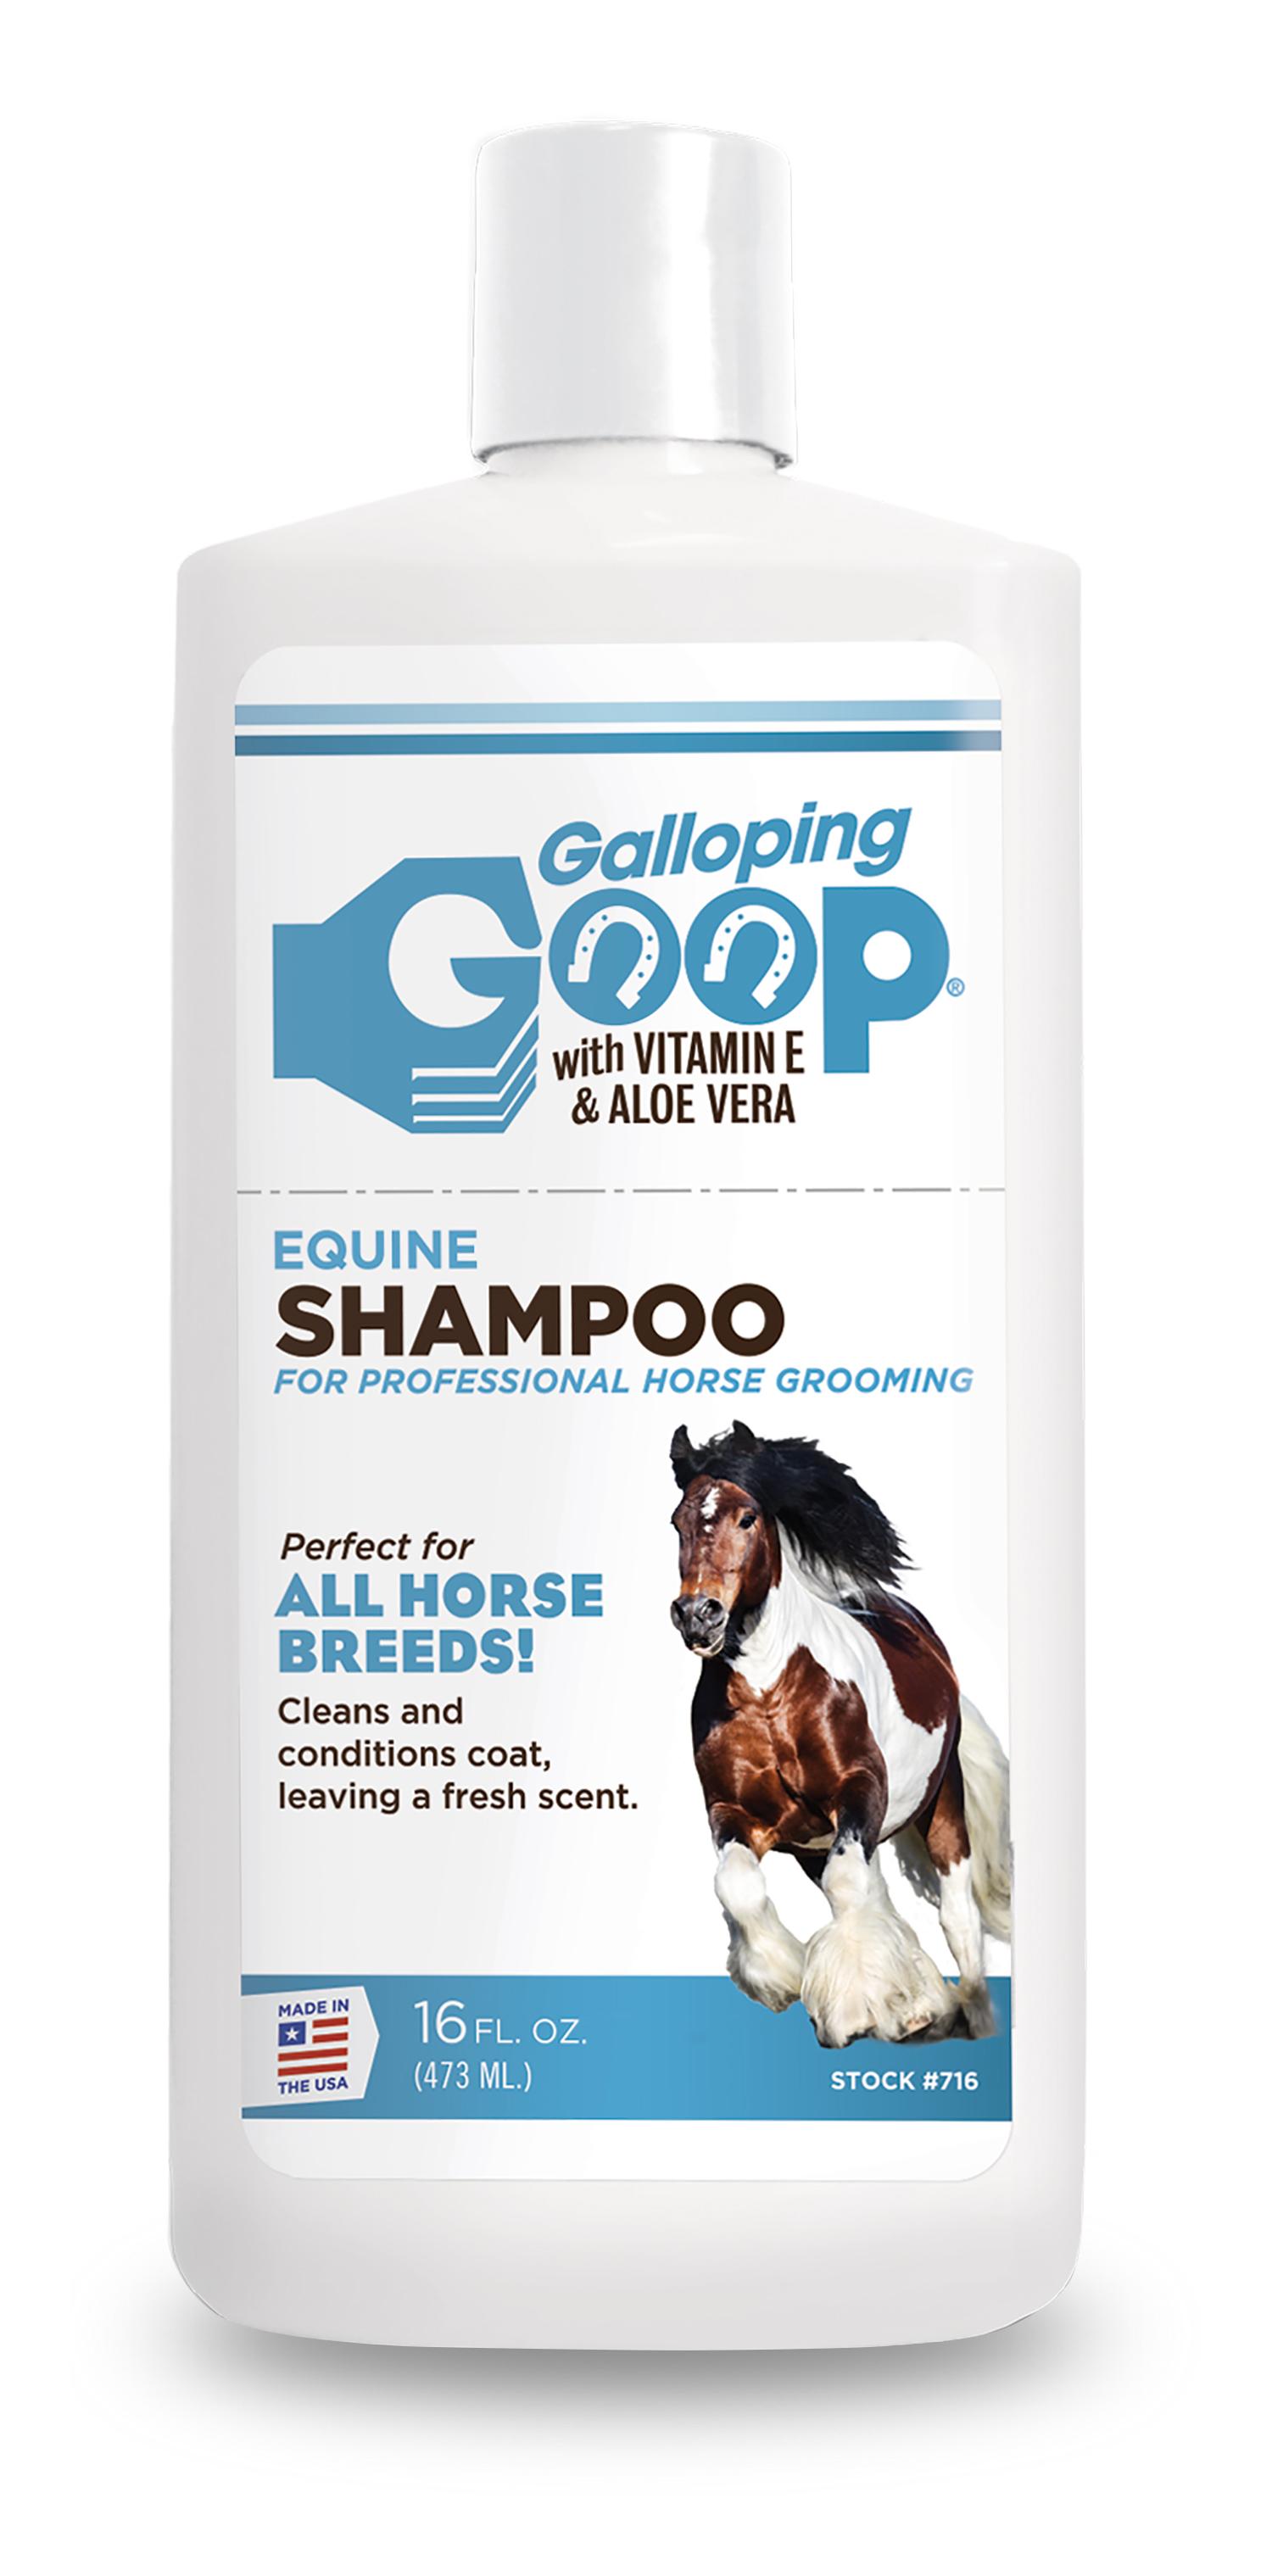 Moms-Goop-Galloping-716-ShampooBottle16oz.jpg